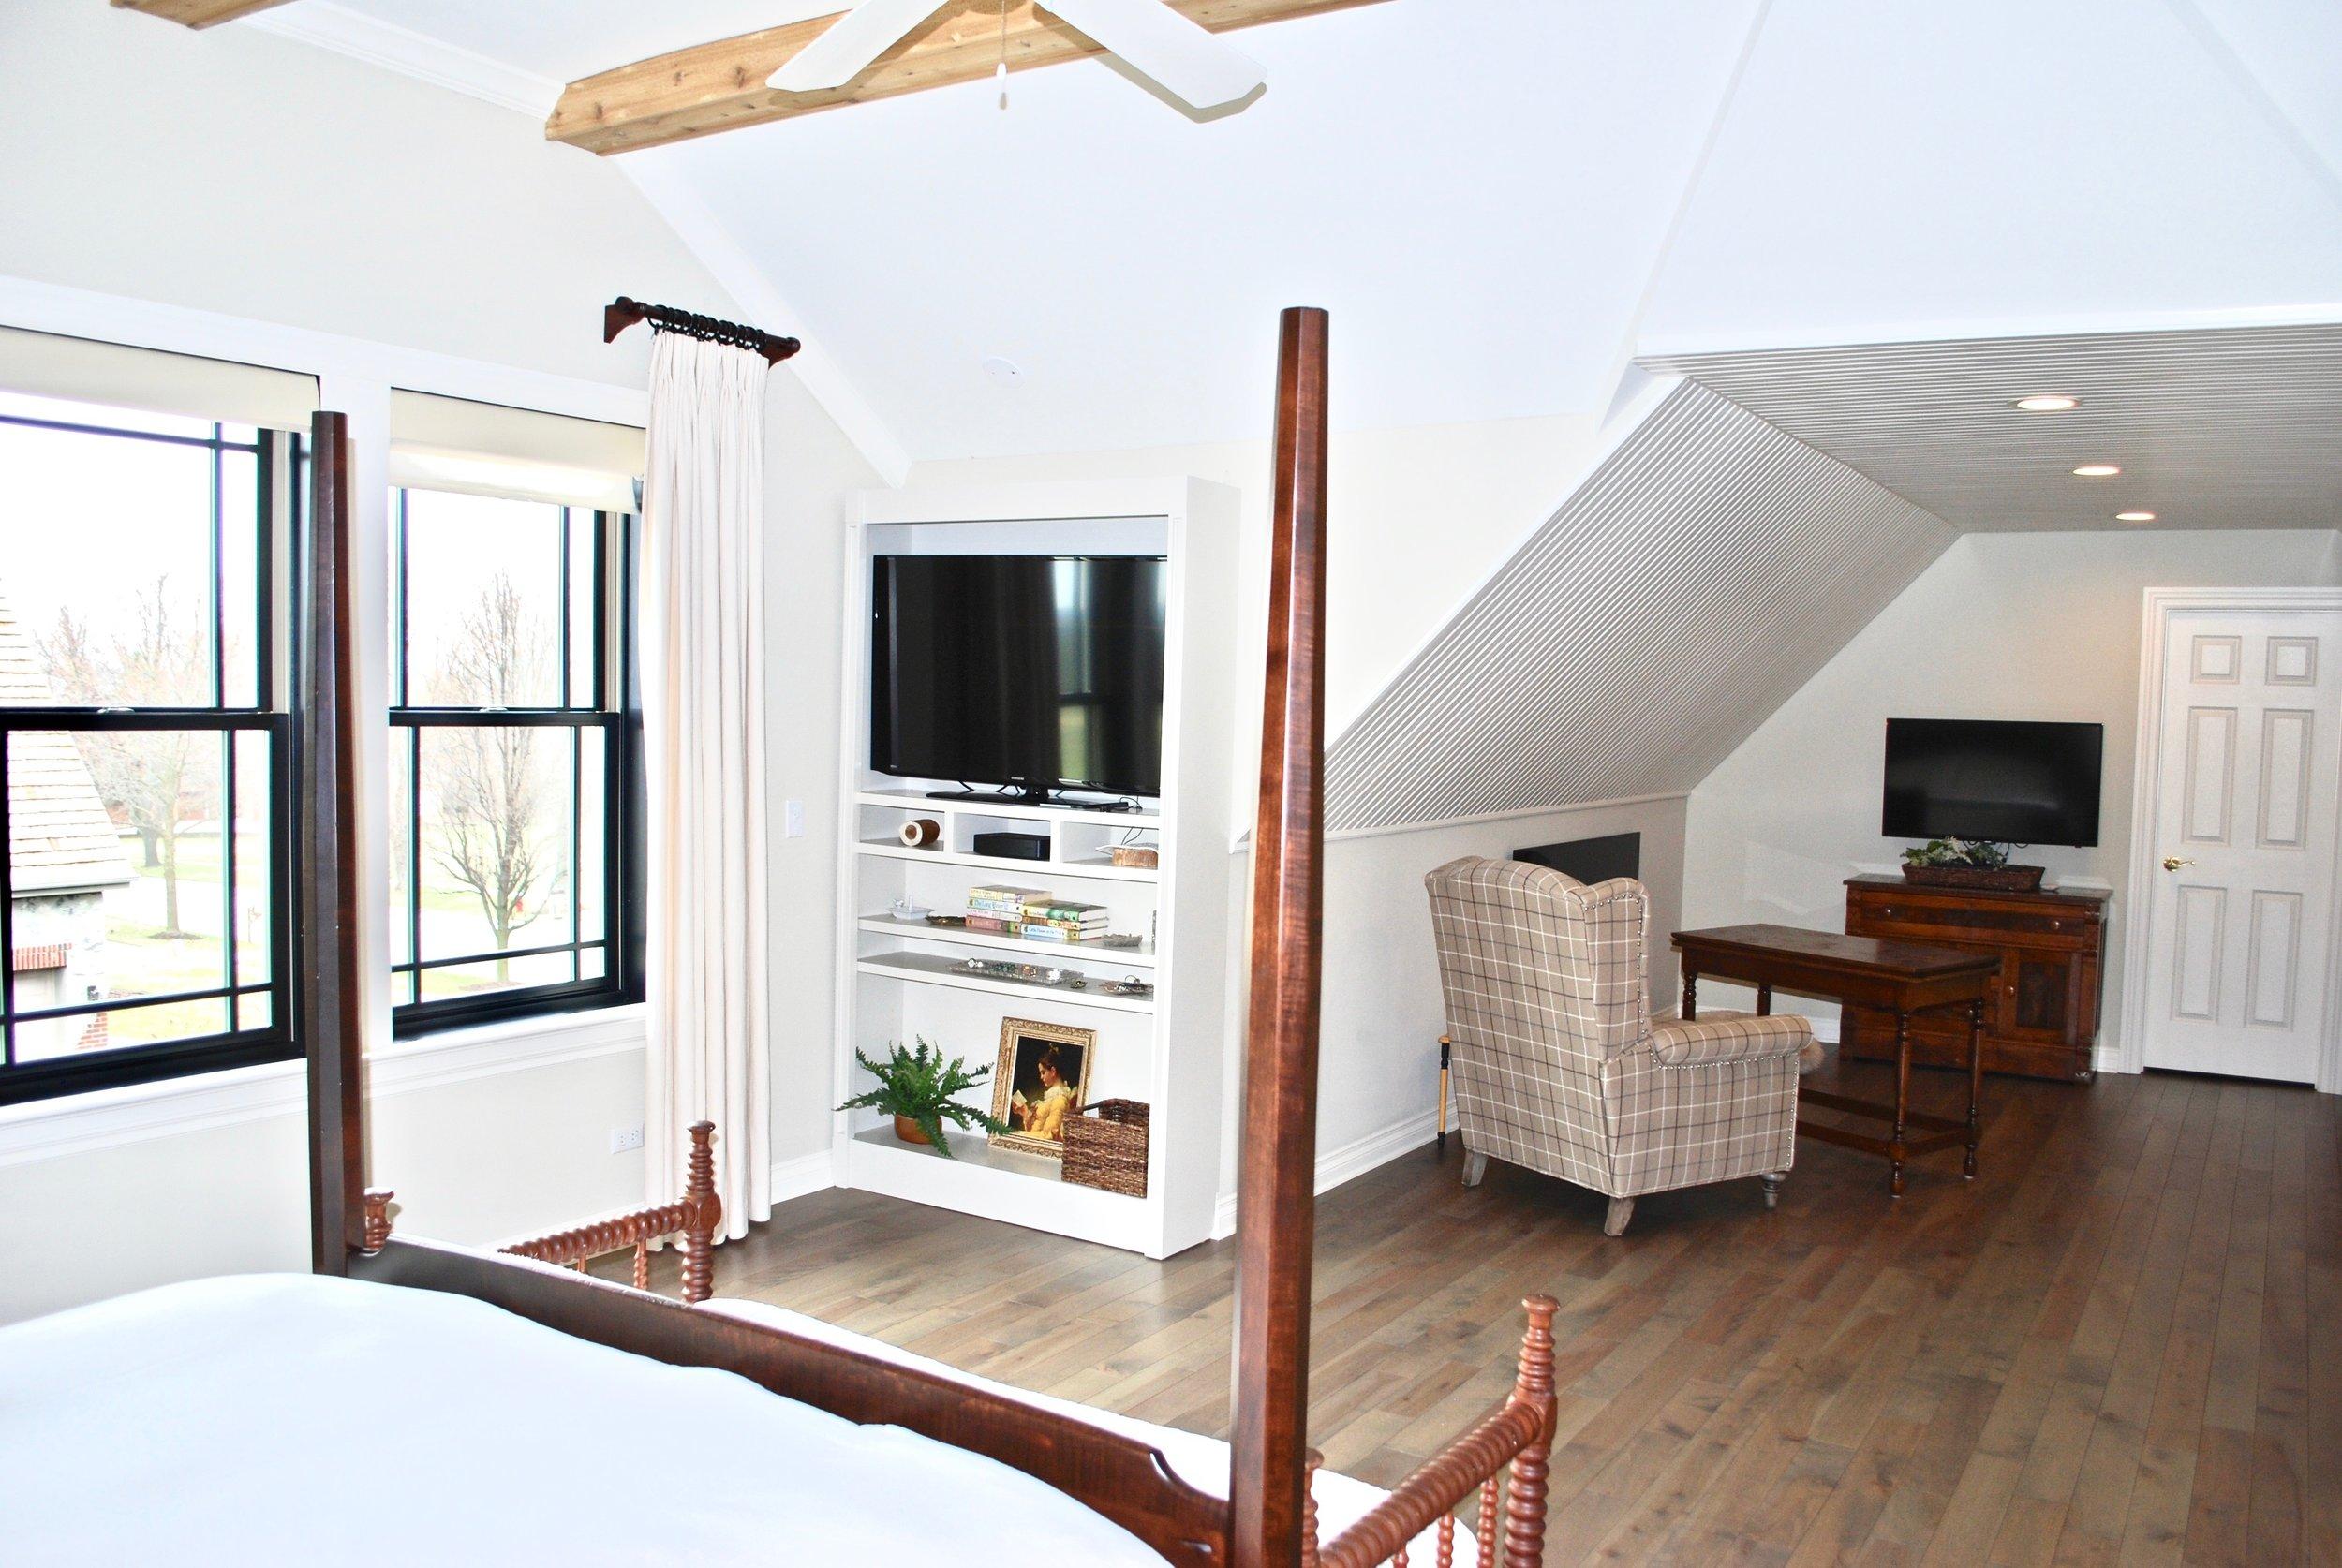 Attic Second Master Bedroom Suite in Geneva IL Remodel.jpg